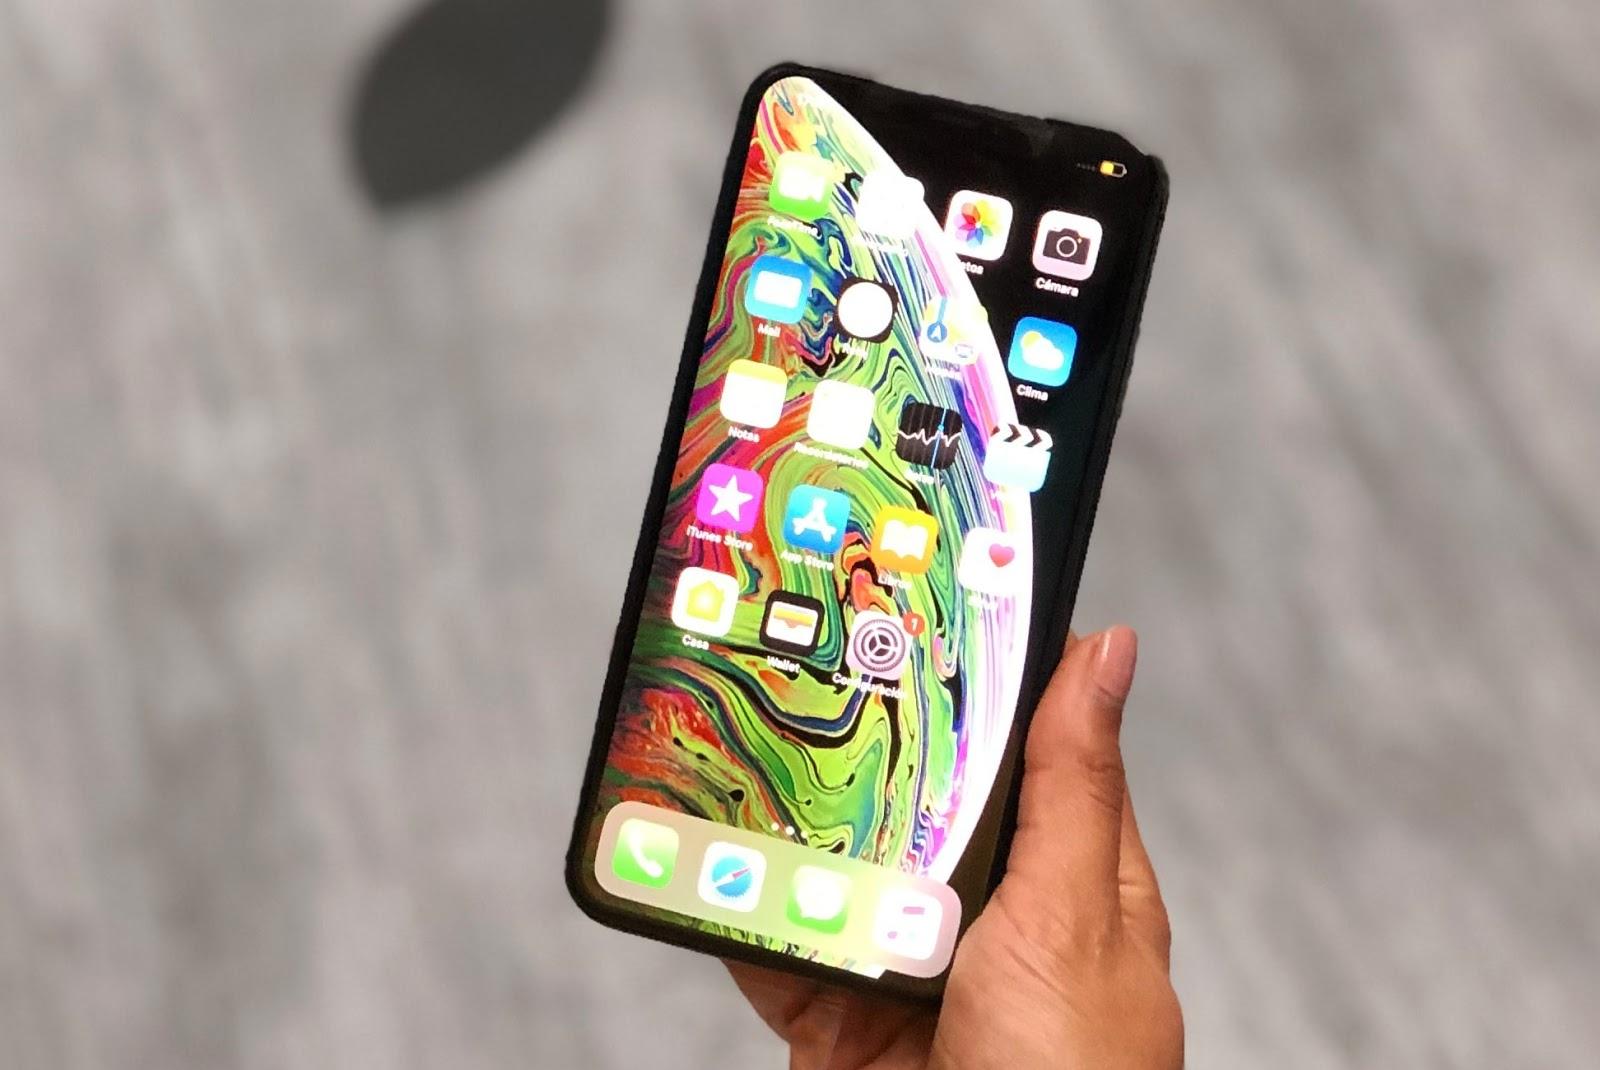 Cara Mengembalikan Aplikasi Bawaan iPhone yang Terhapus  PUKEVA